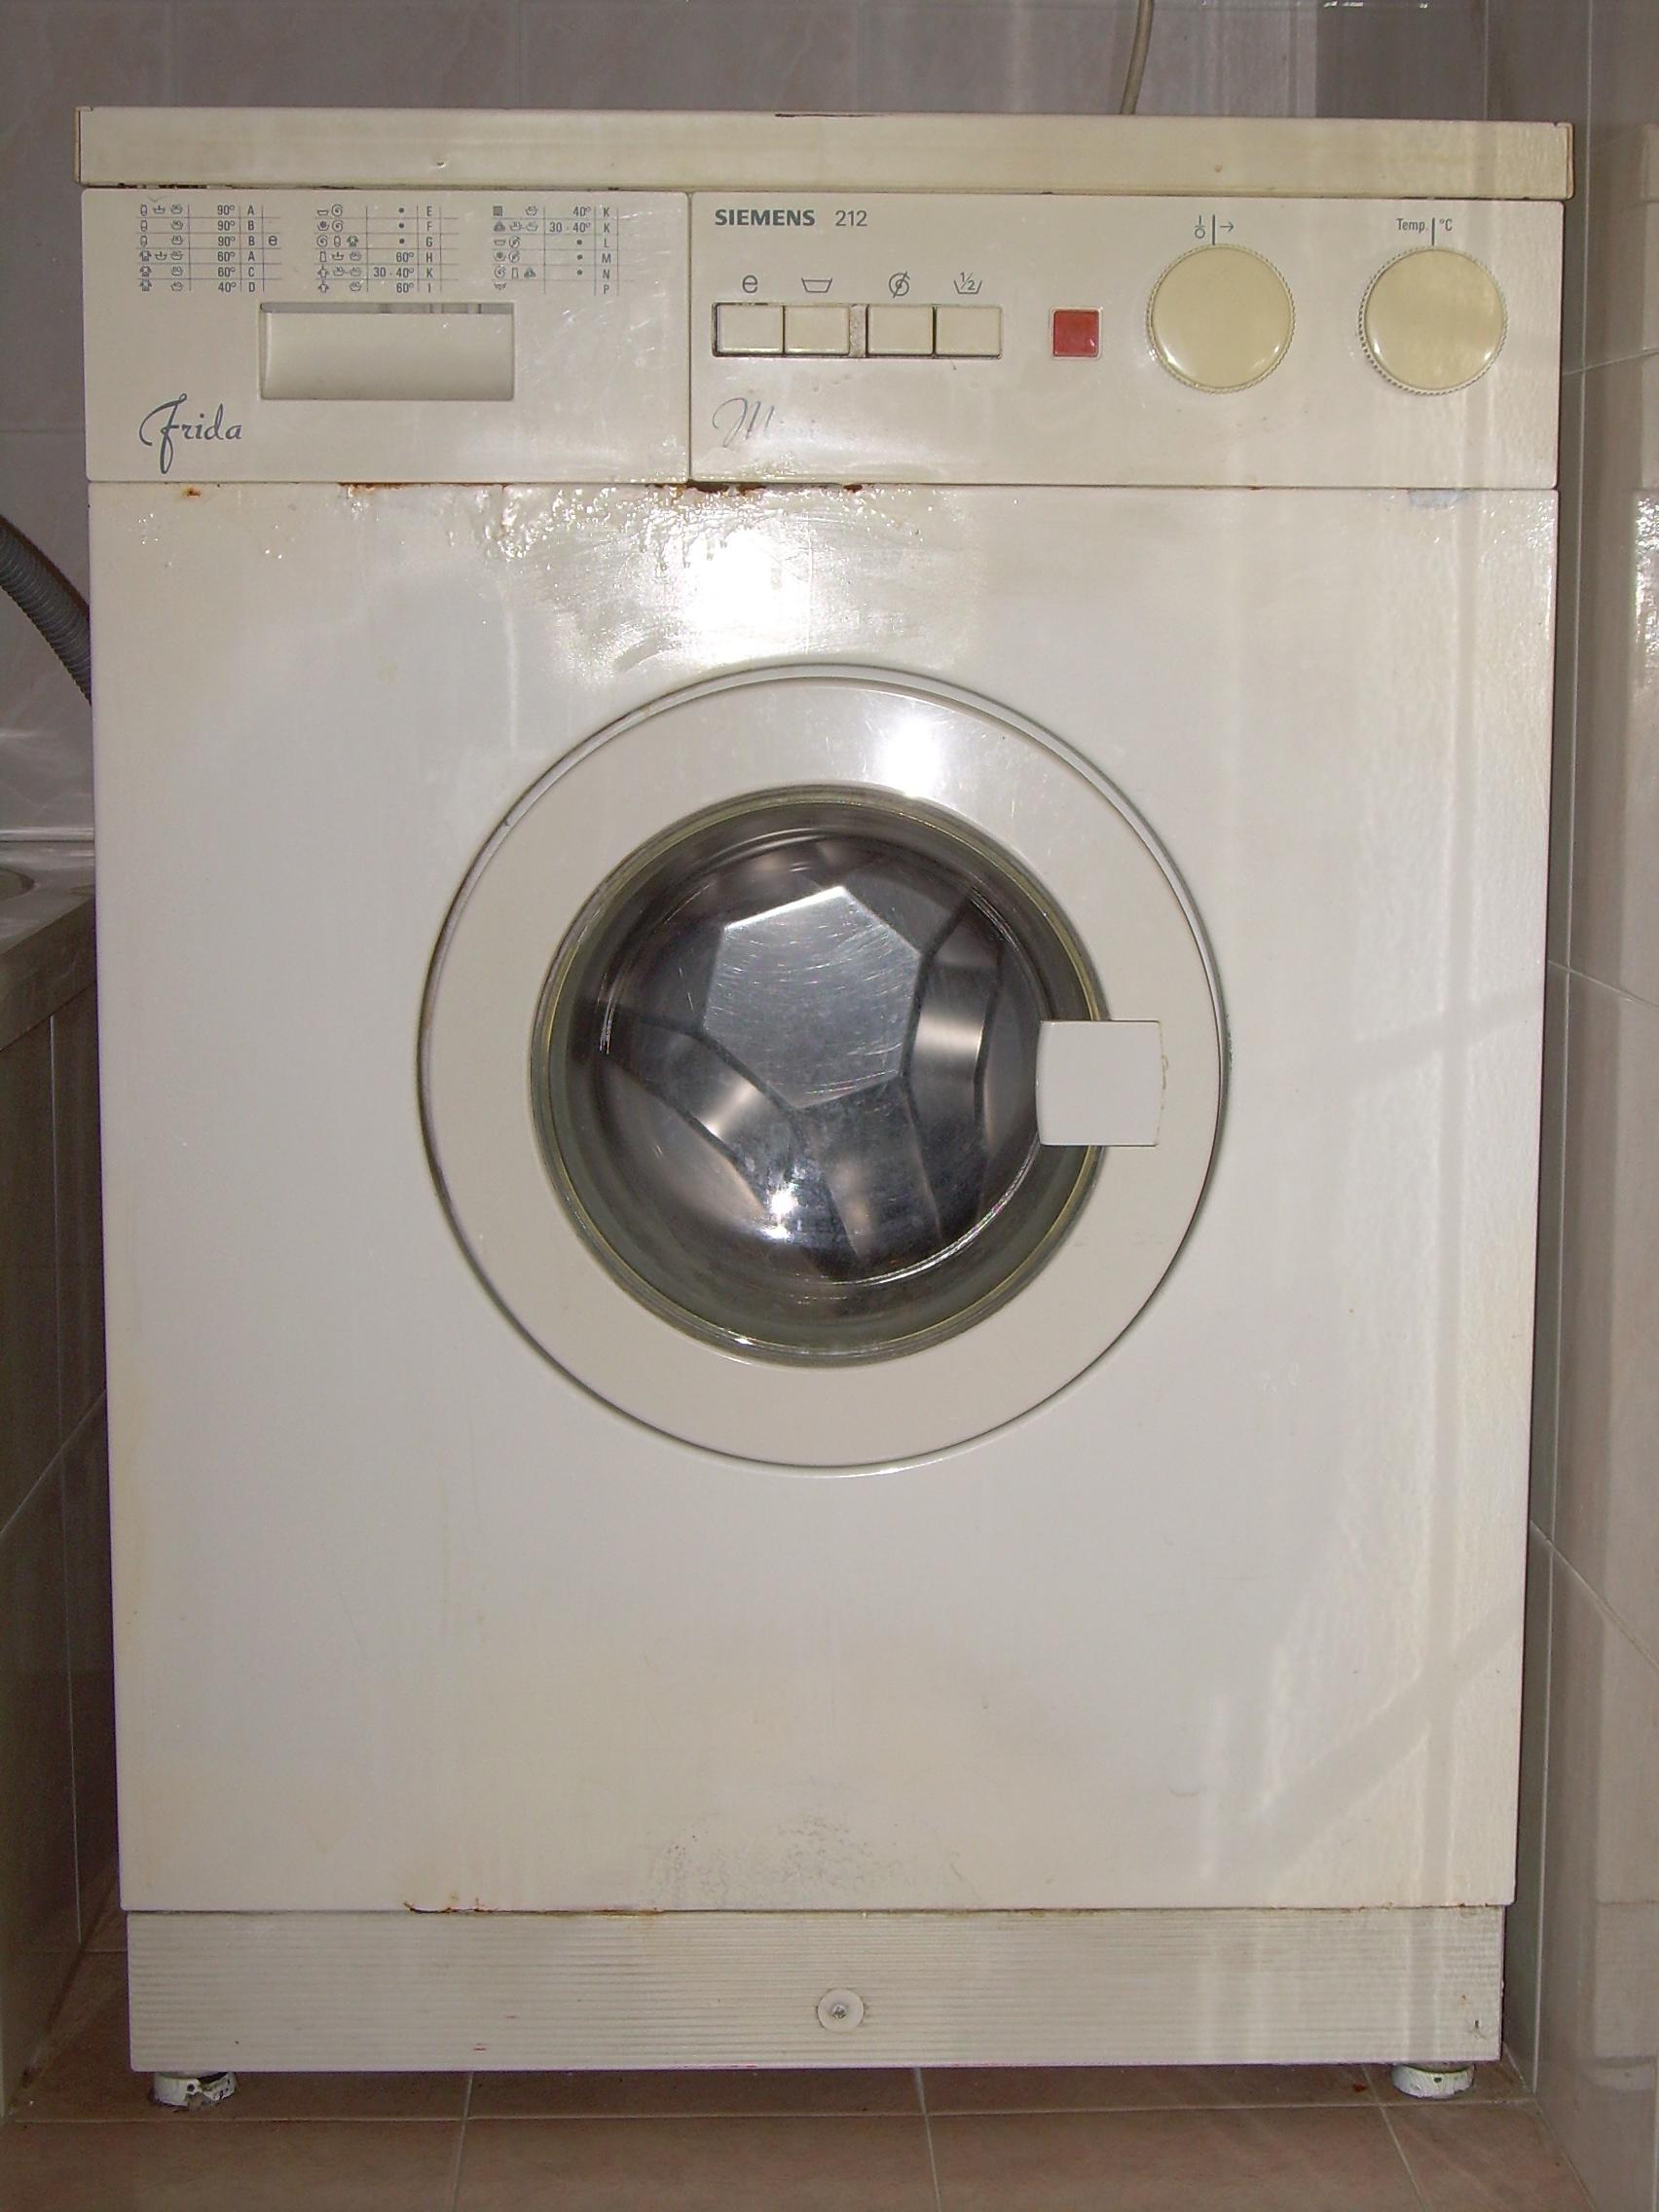 File lavatrice siemens 212 mini 39 frida 39 jpg wikimedia for Mini lavatrice